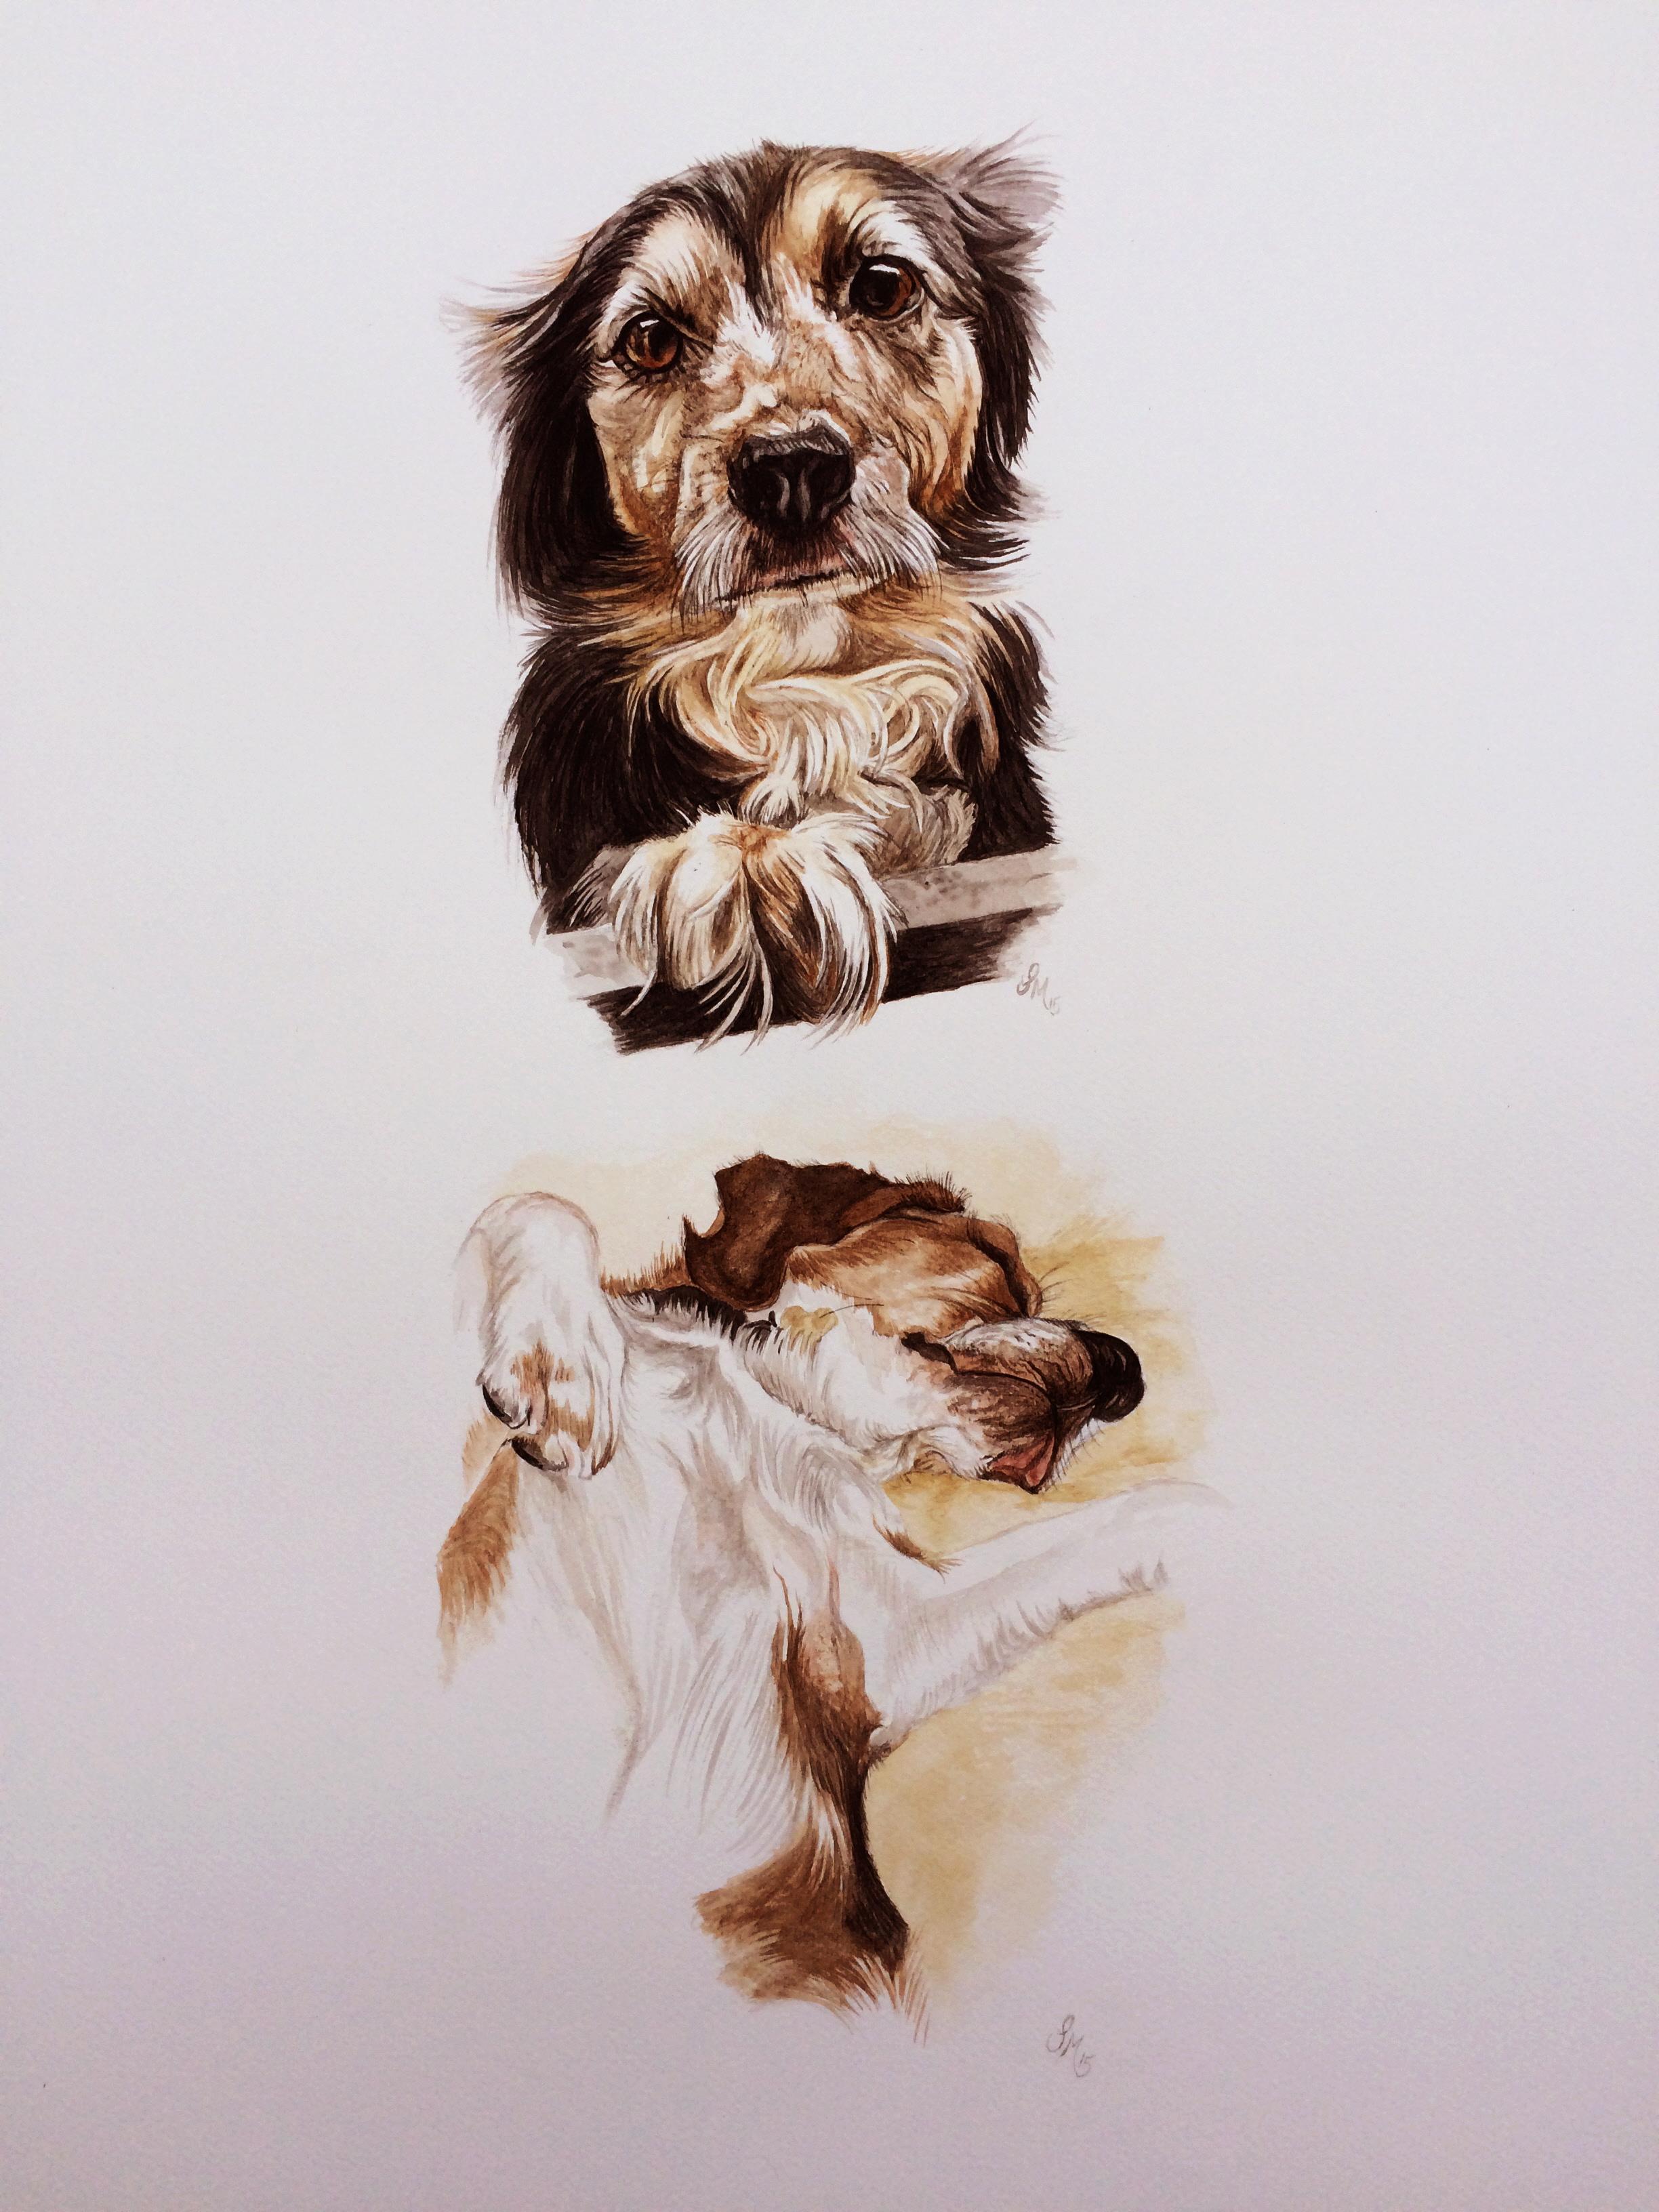 dog animal pet portrait